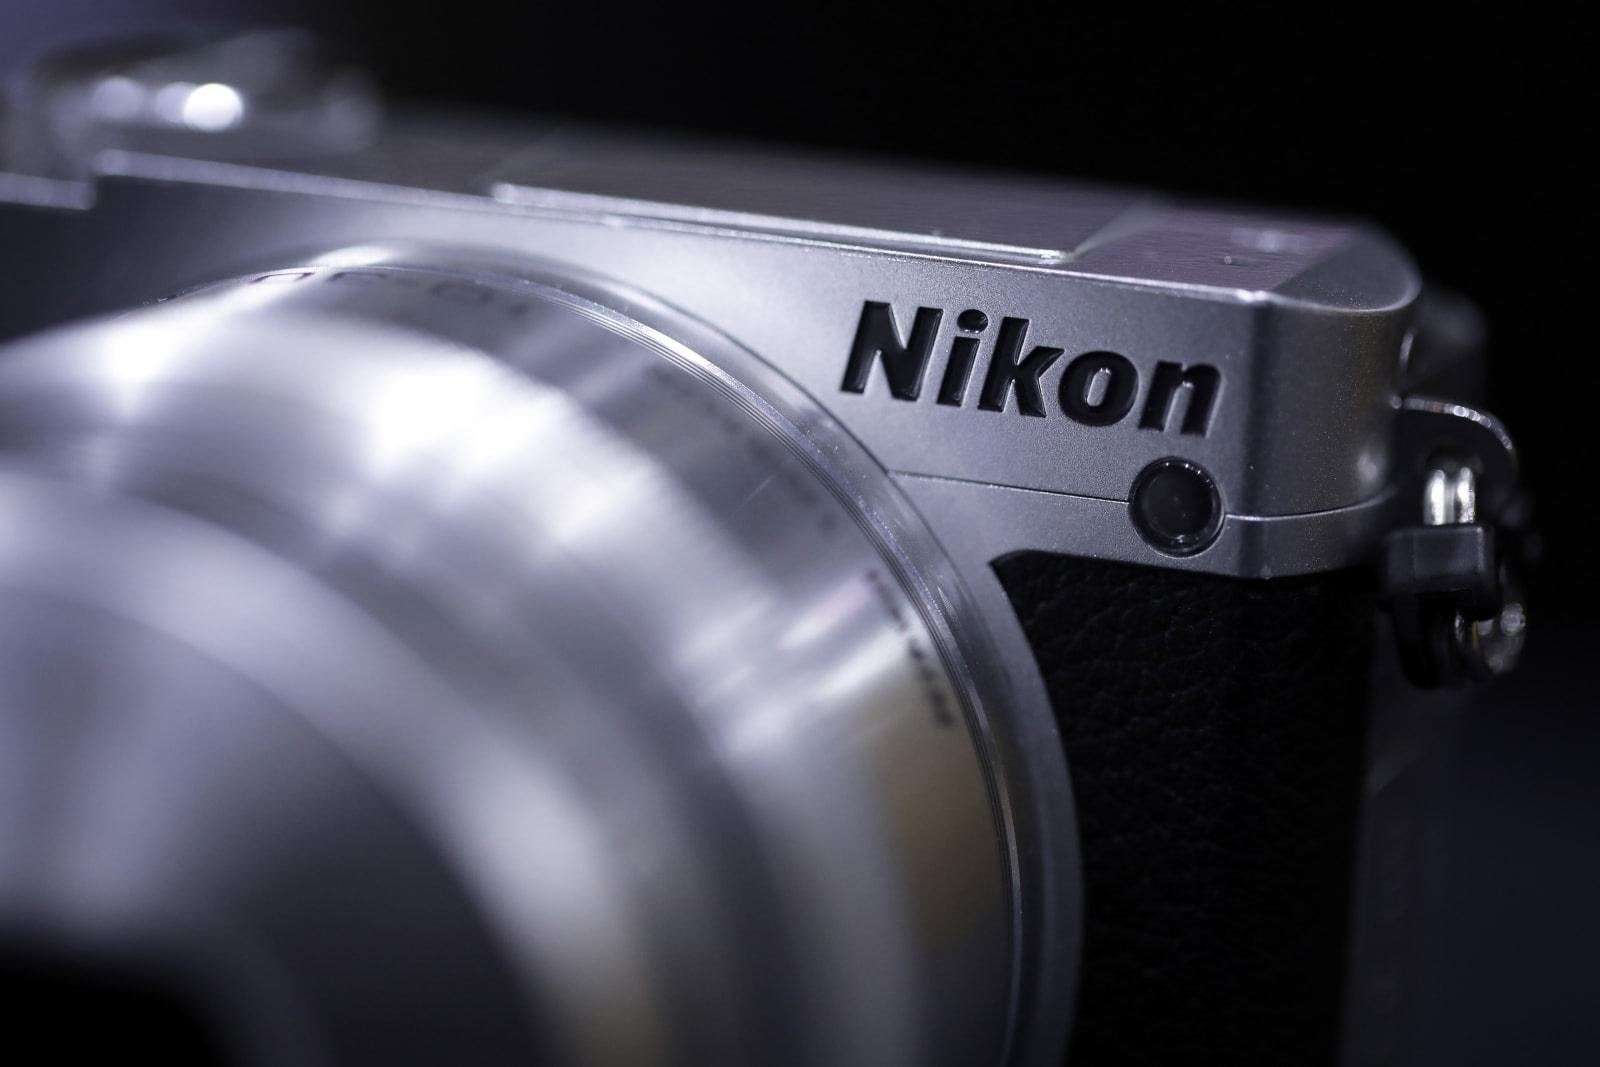 Nikon is making a full-frame mirrorless camera